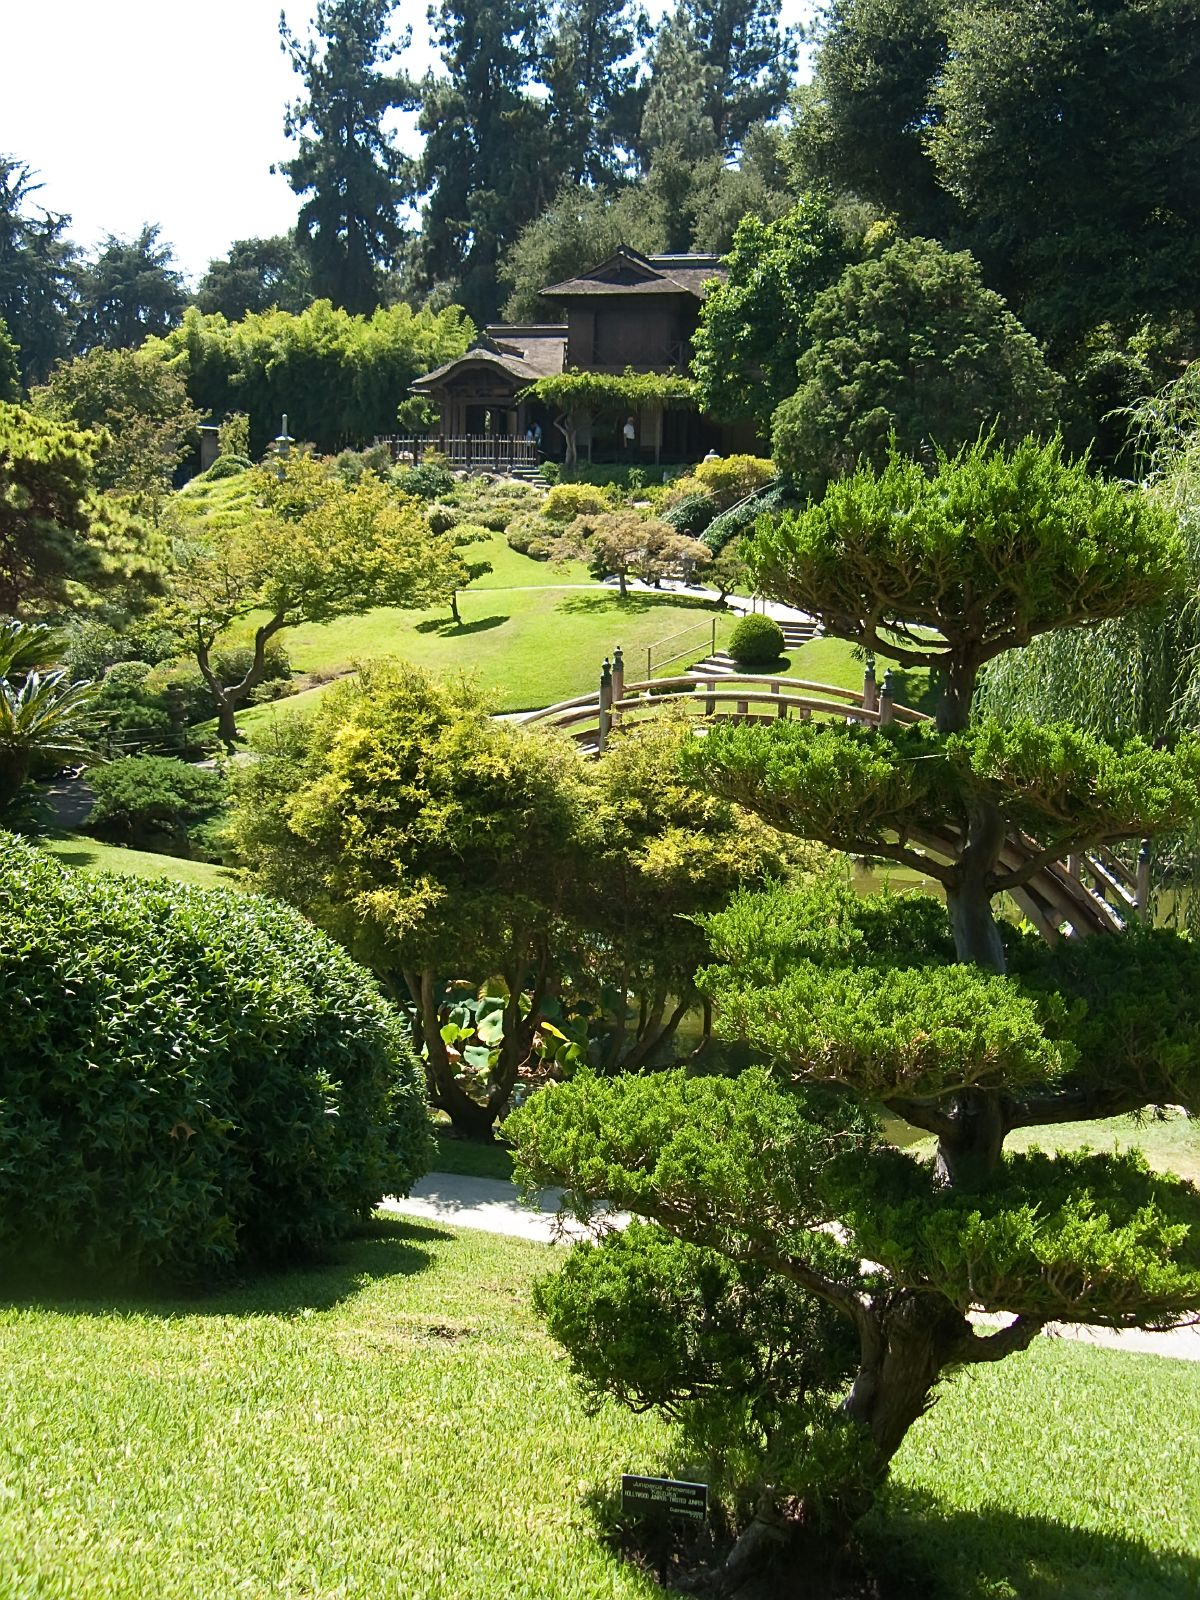 Artisticly Pruned Trees In Japanese Garden At Huntington Gardens Pasadena California Flickr